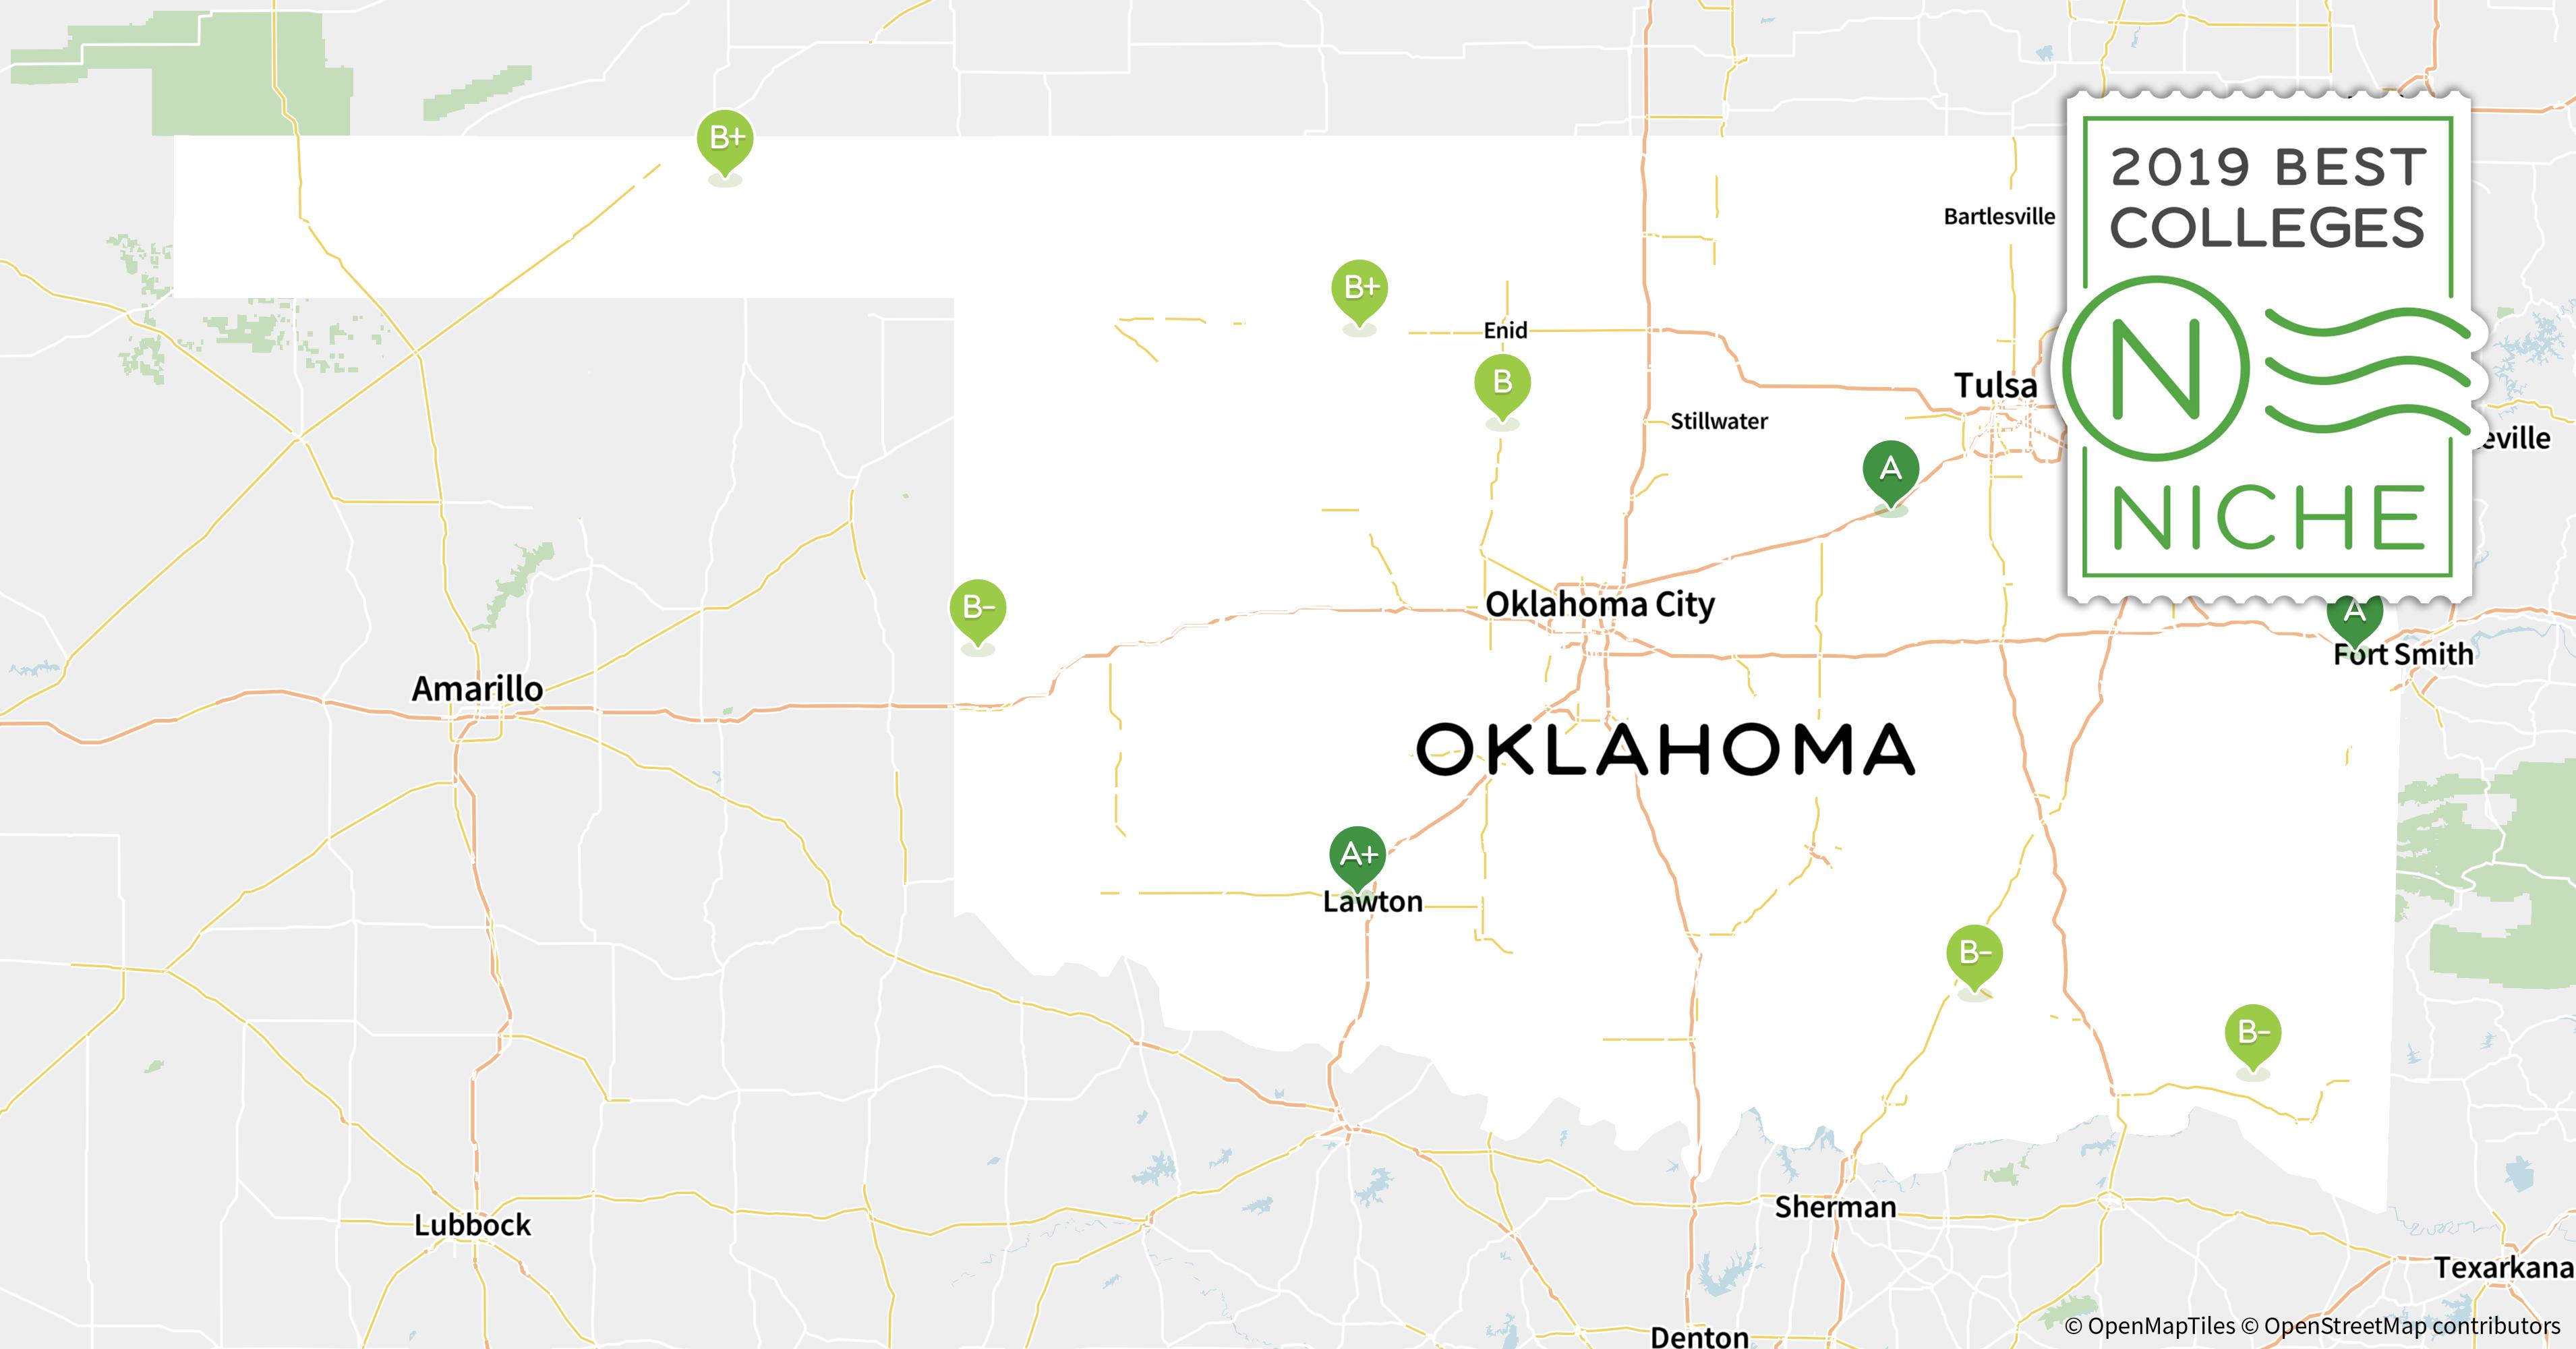 Universities In Oklahoma >> 2019 Top Graduate Programs In Oklahoma Niche